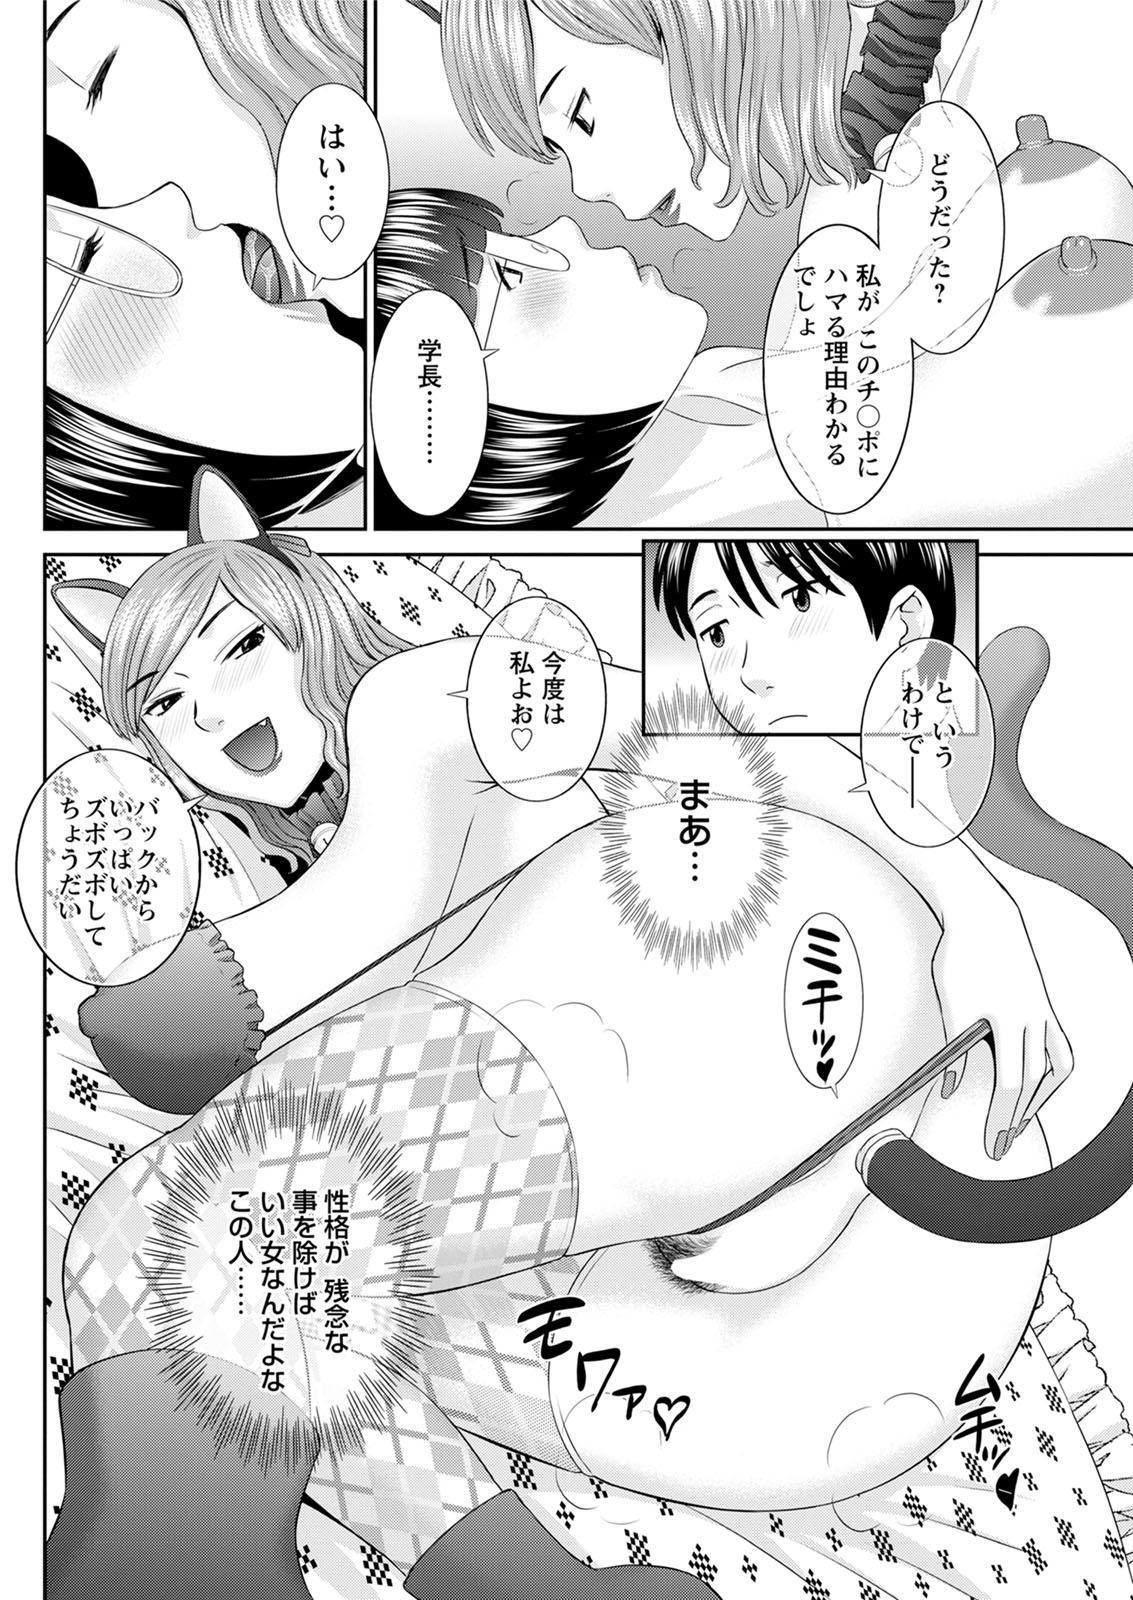 [Kawamori Misaki] Kaikan Hitotsuma Gakuen Ch. 1-6, 8-20 [Digital] 252